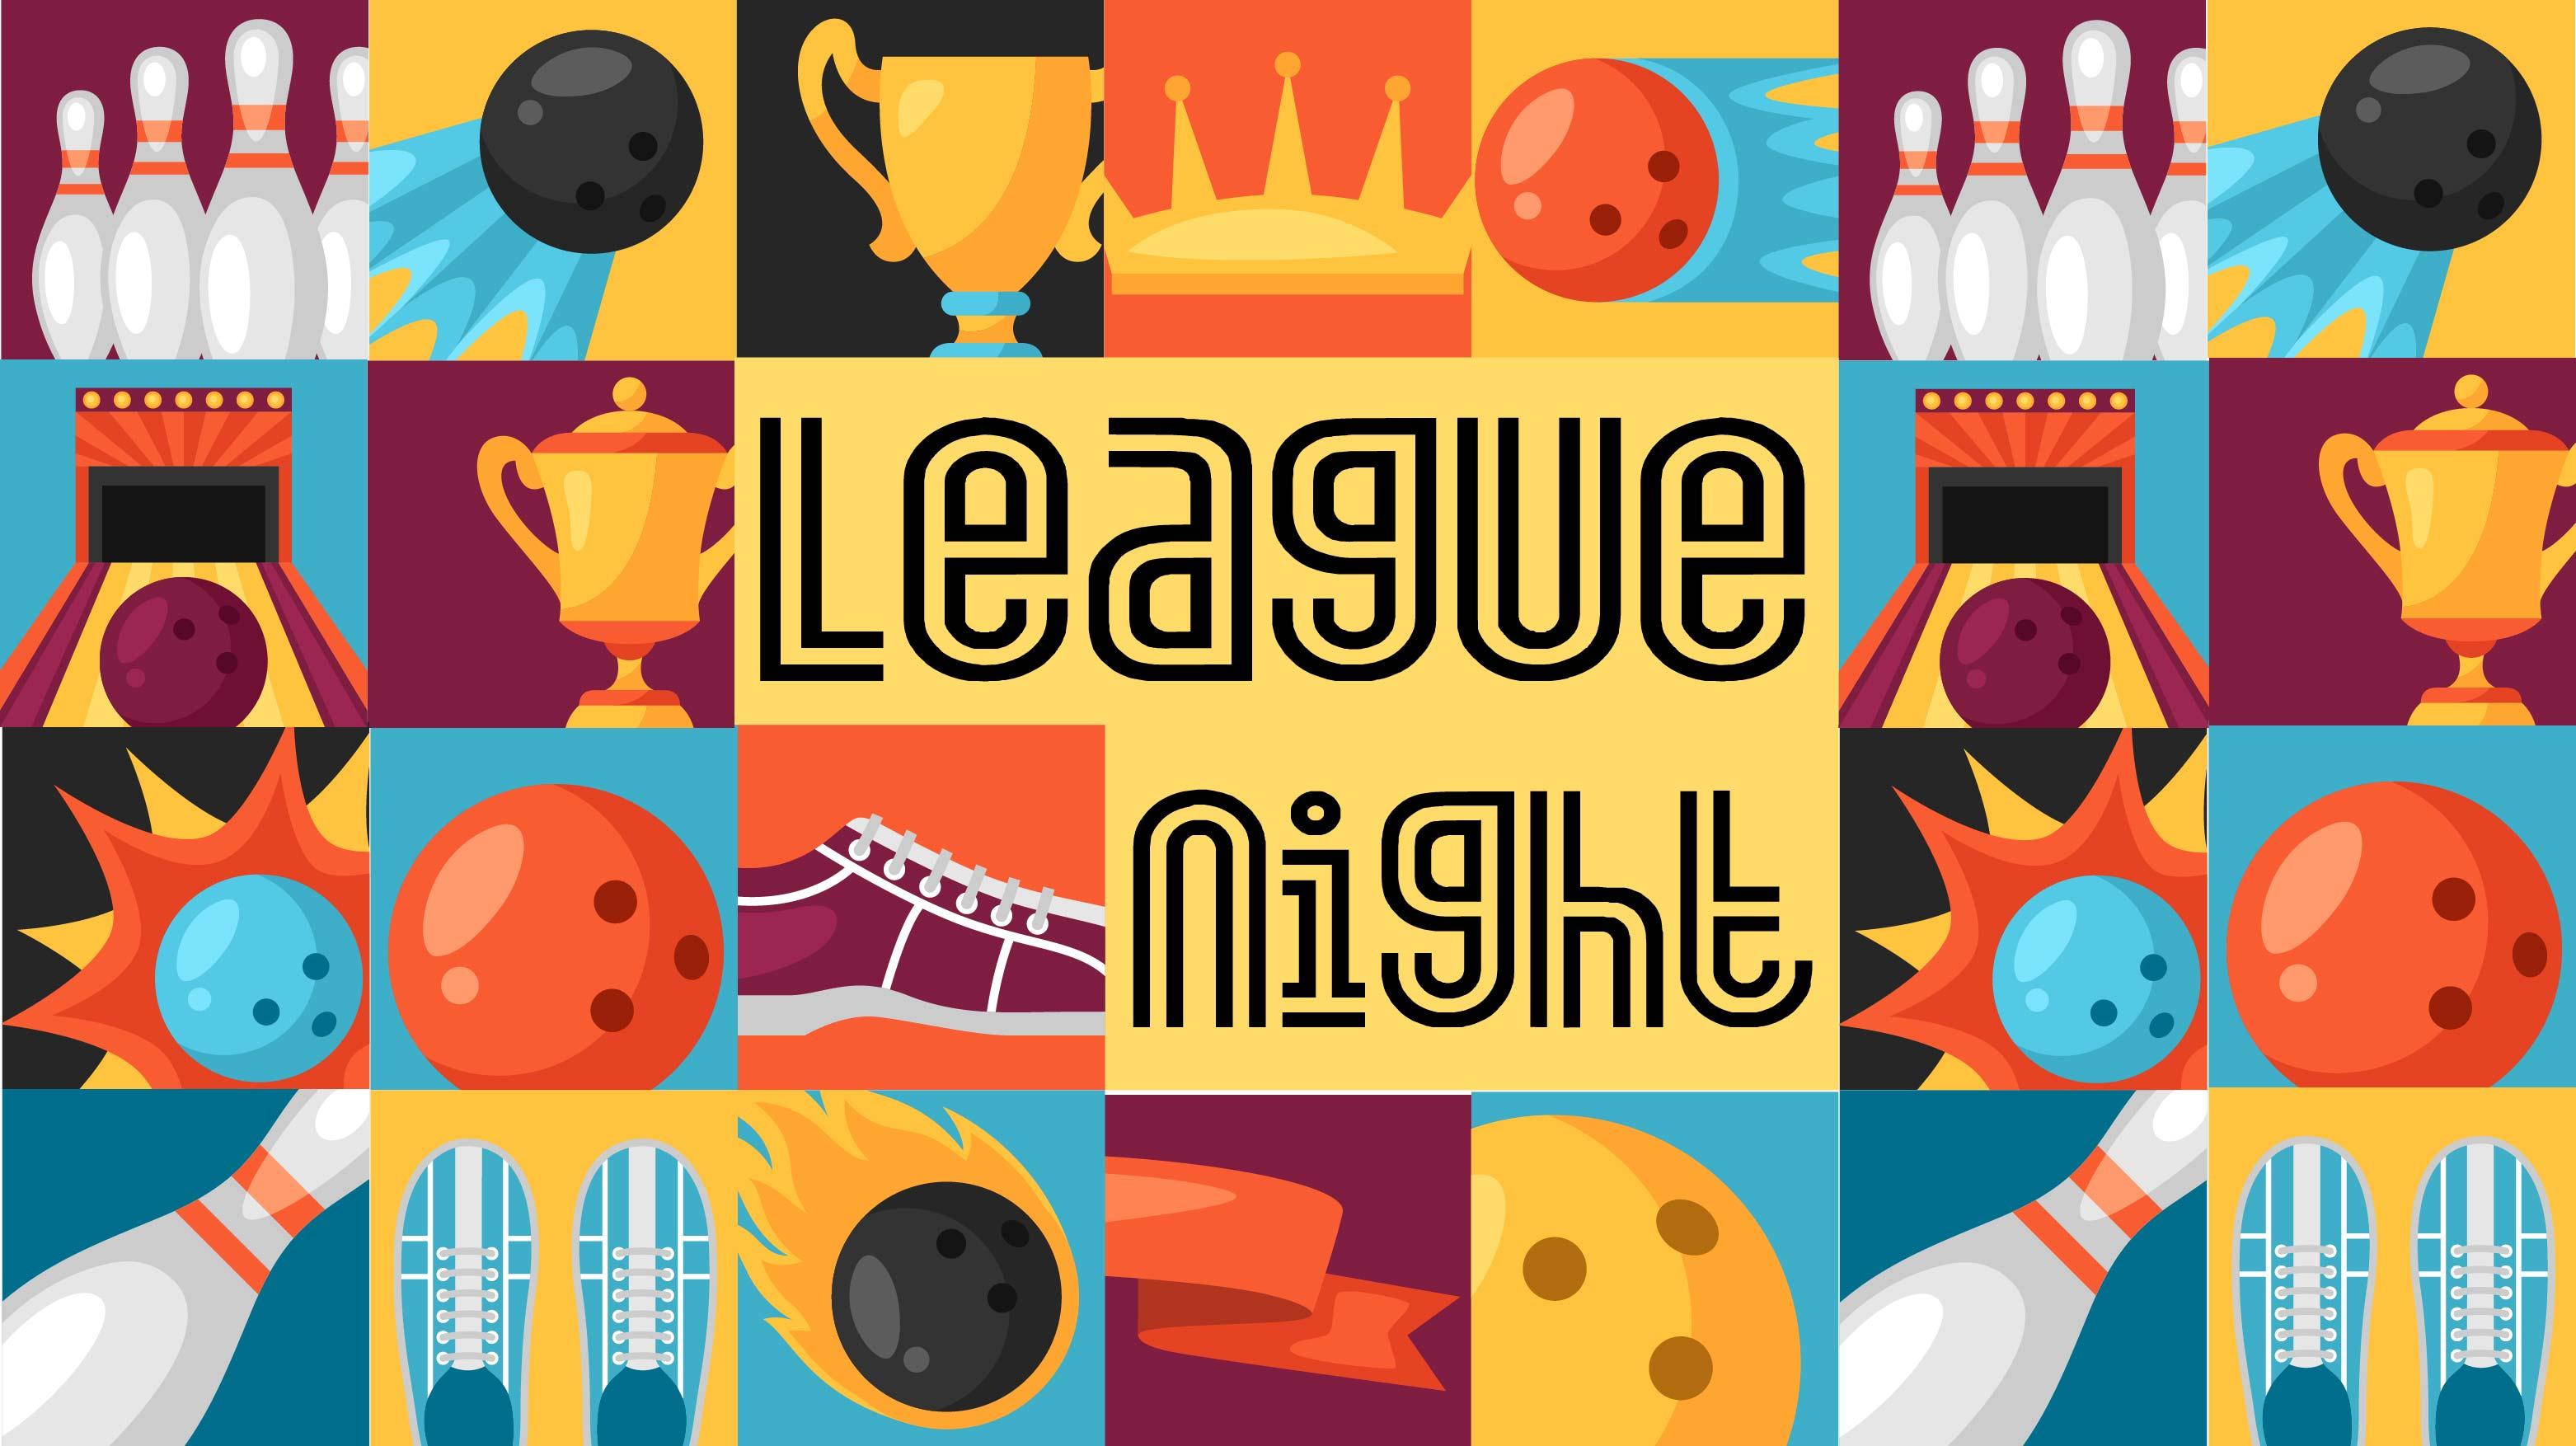 League Night